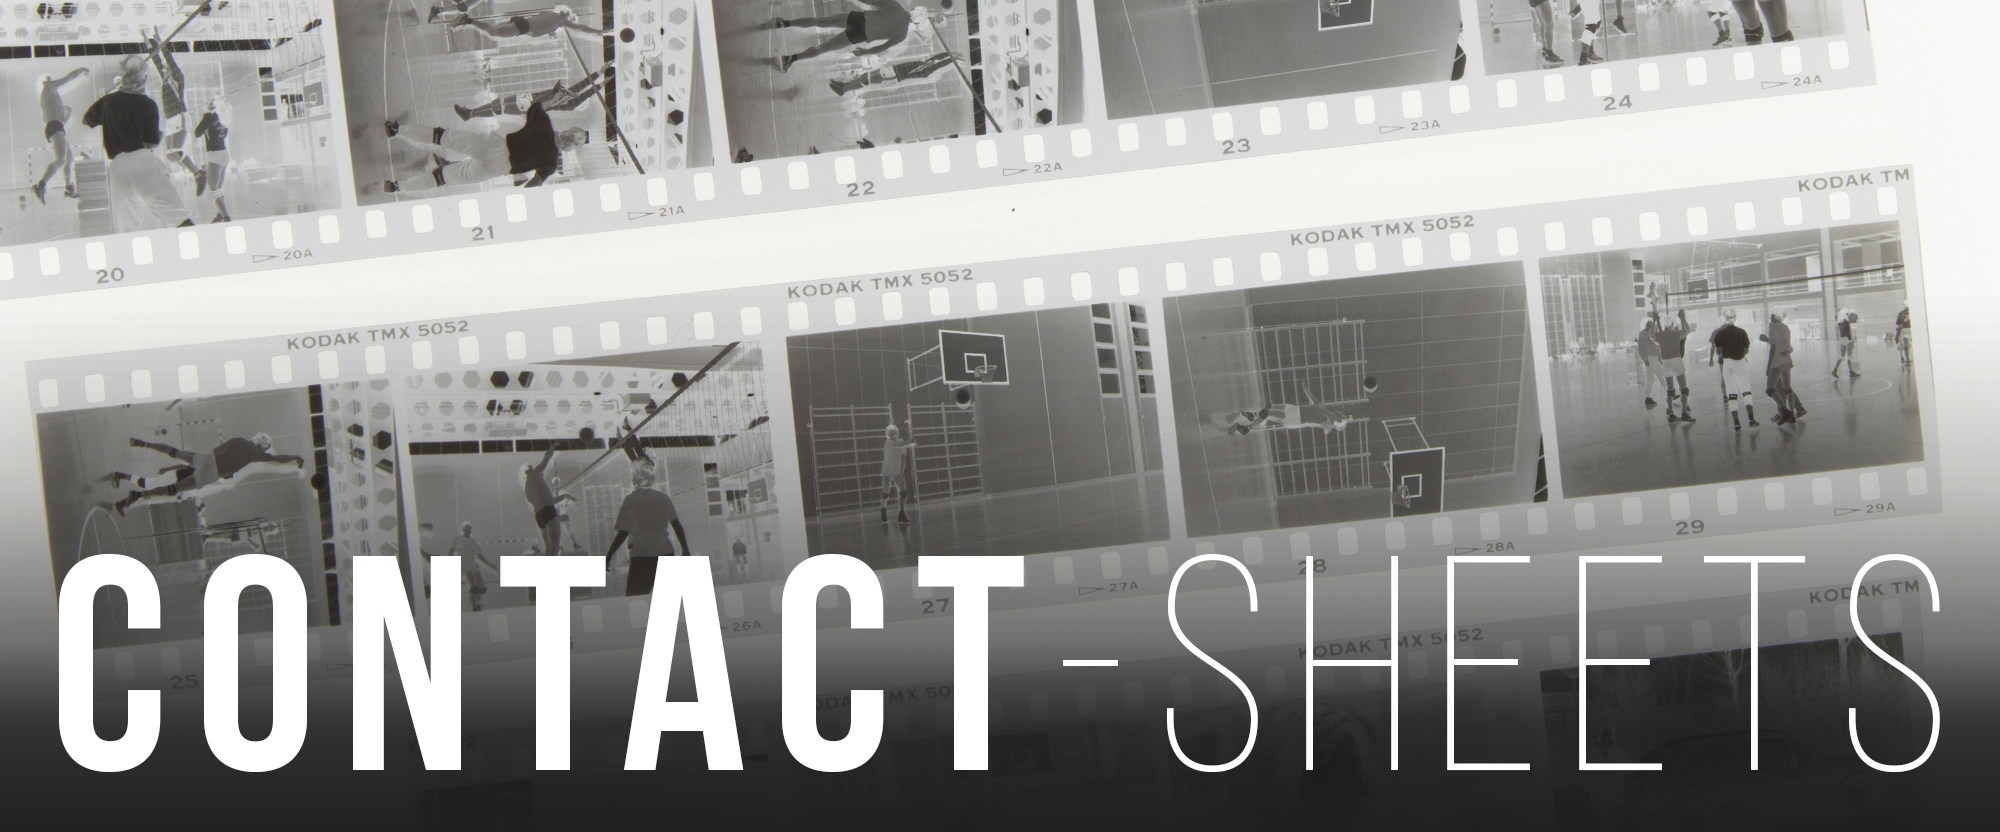 Moderne Analog-Fotografie:  Digitale Contact Sheets